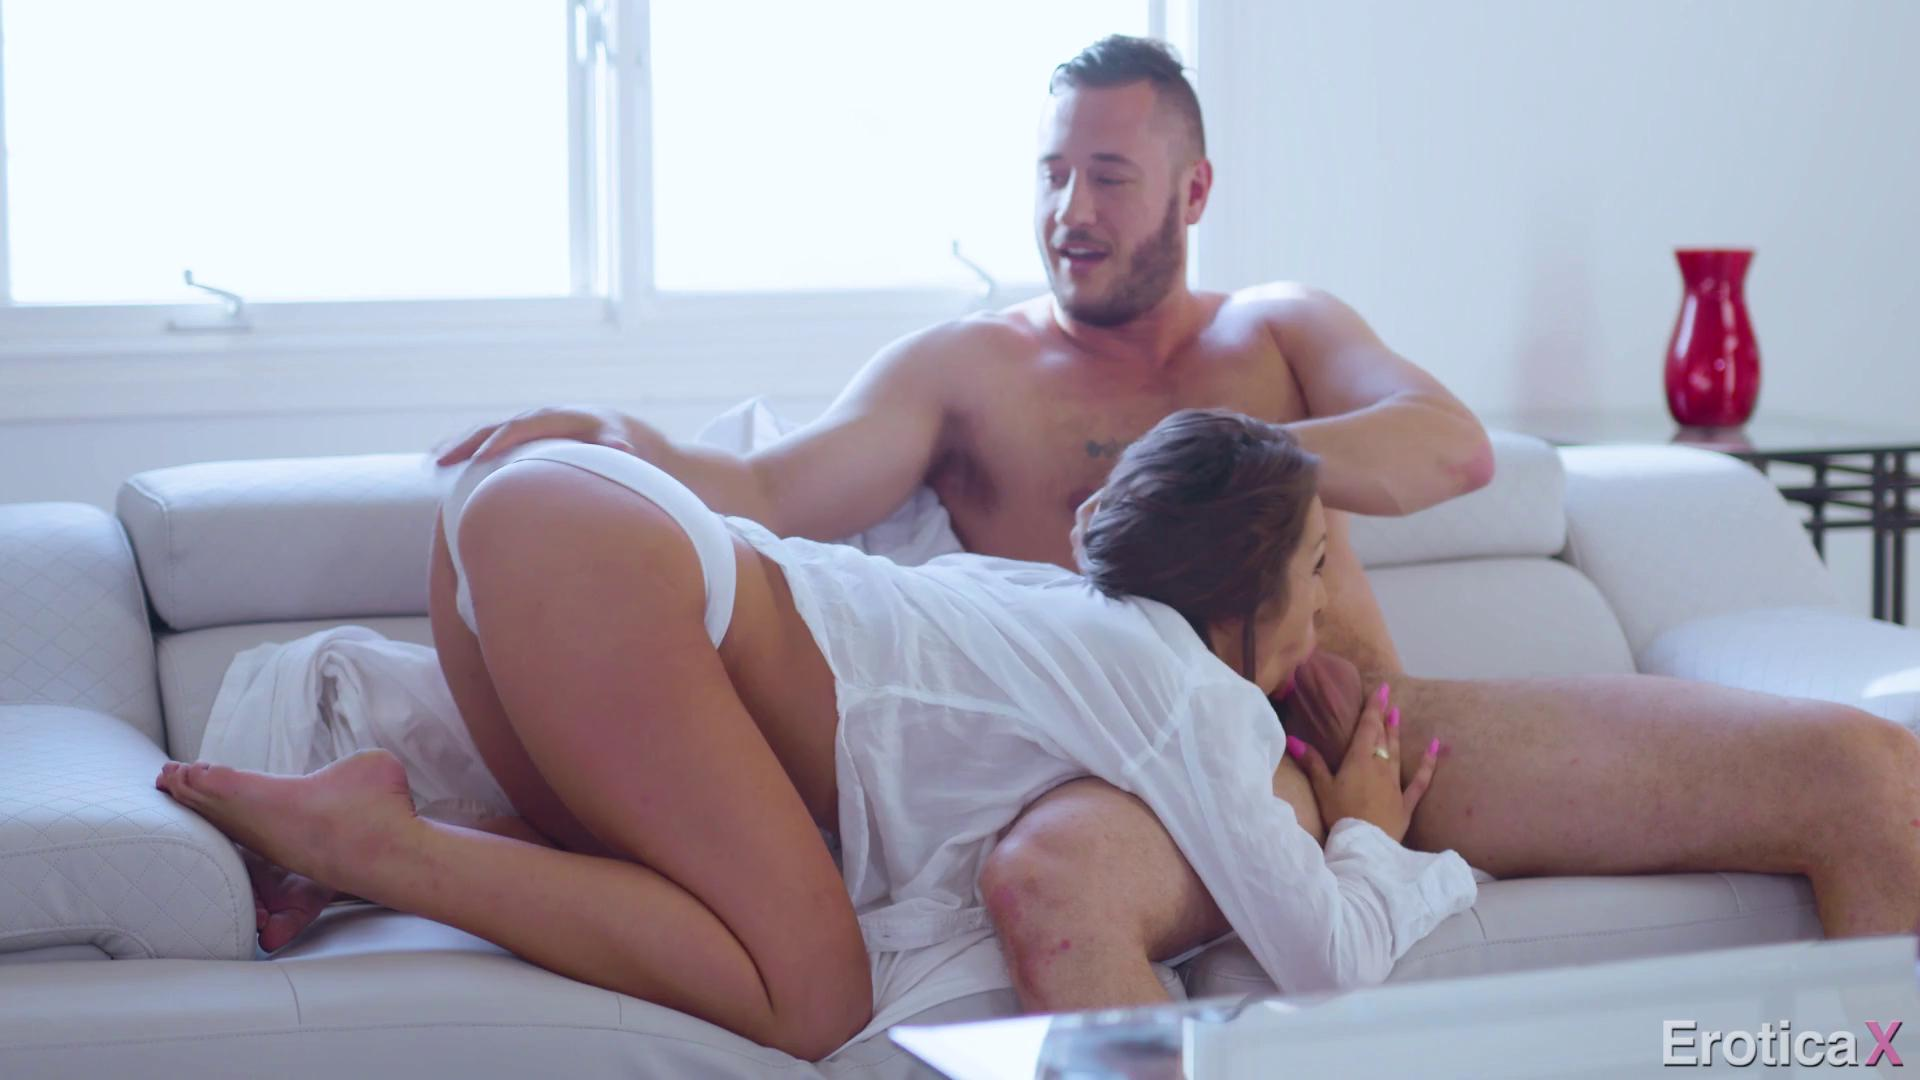 EroticaX – Carmen Caliente A Perfect Sunday Morning